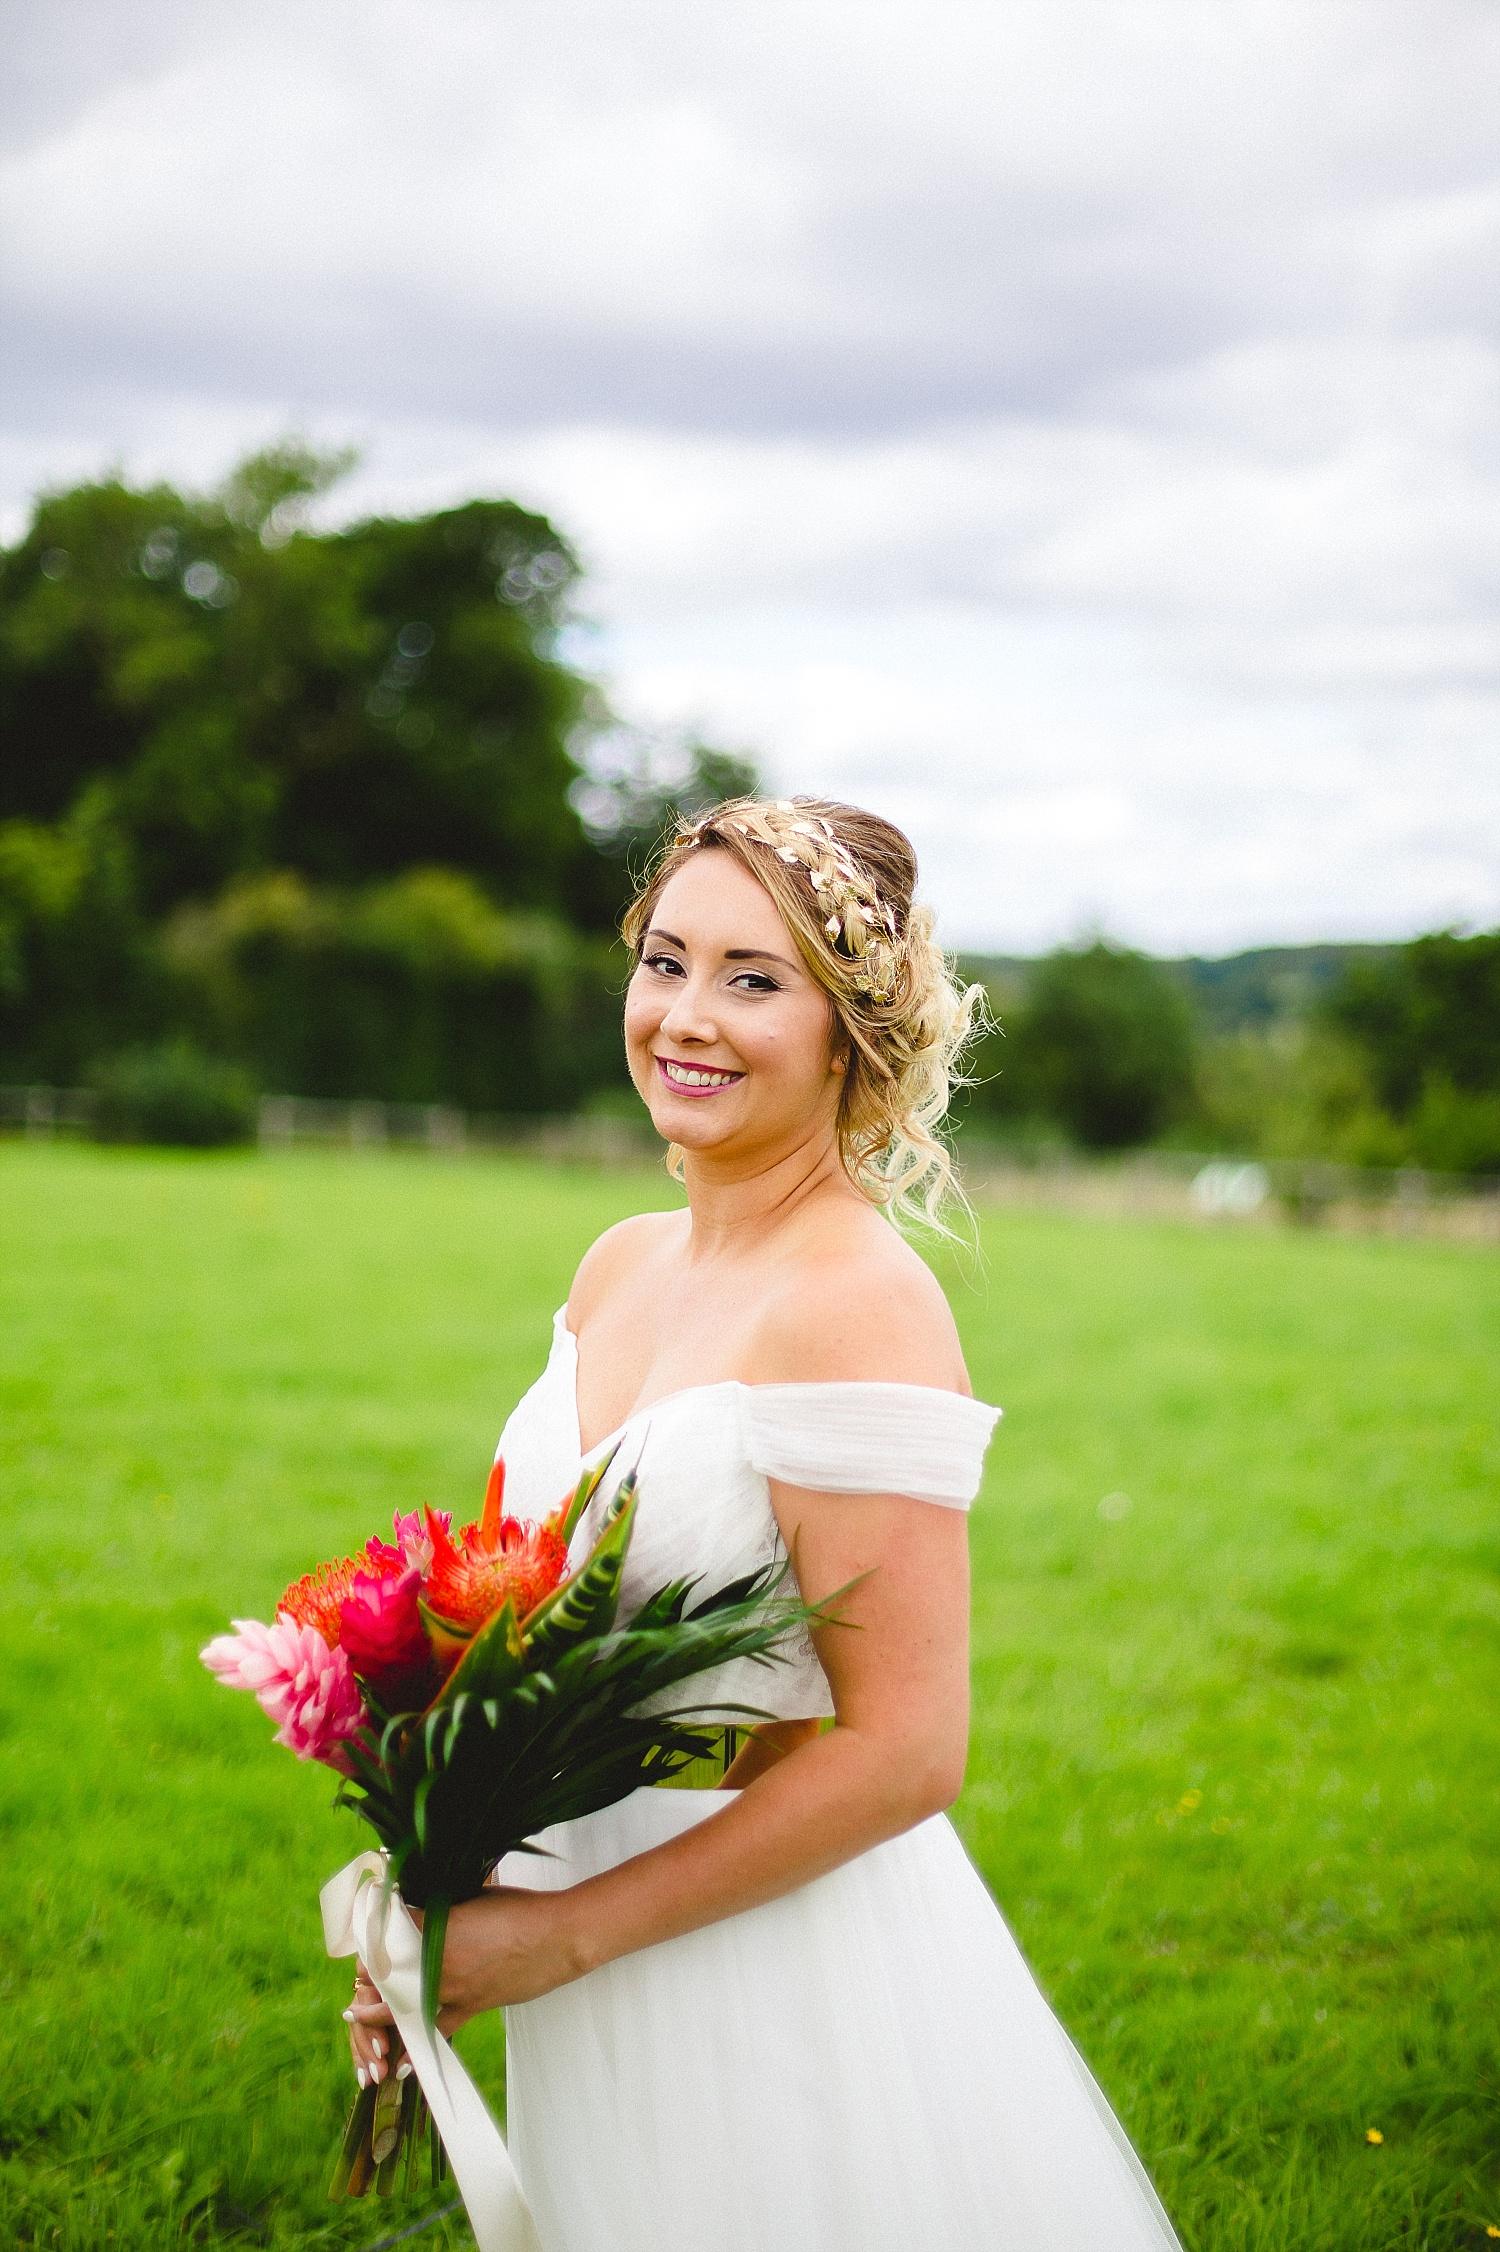 North-Hill-Farm-Wedding-Photographer_0070.jpg